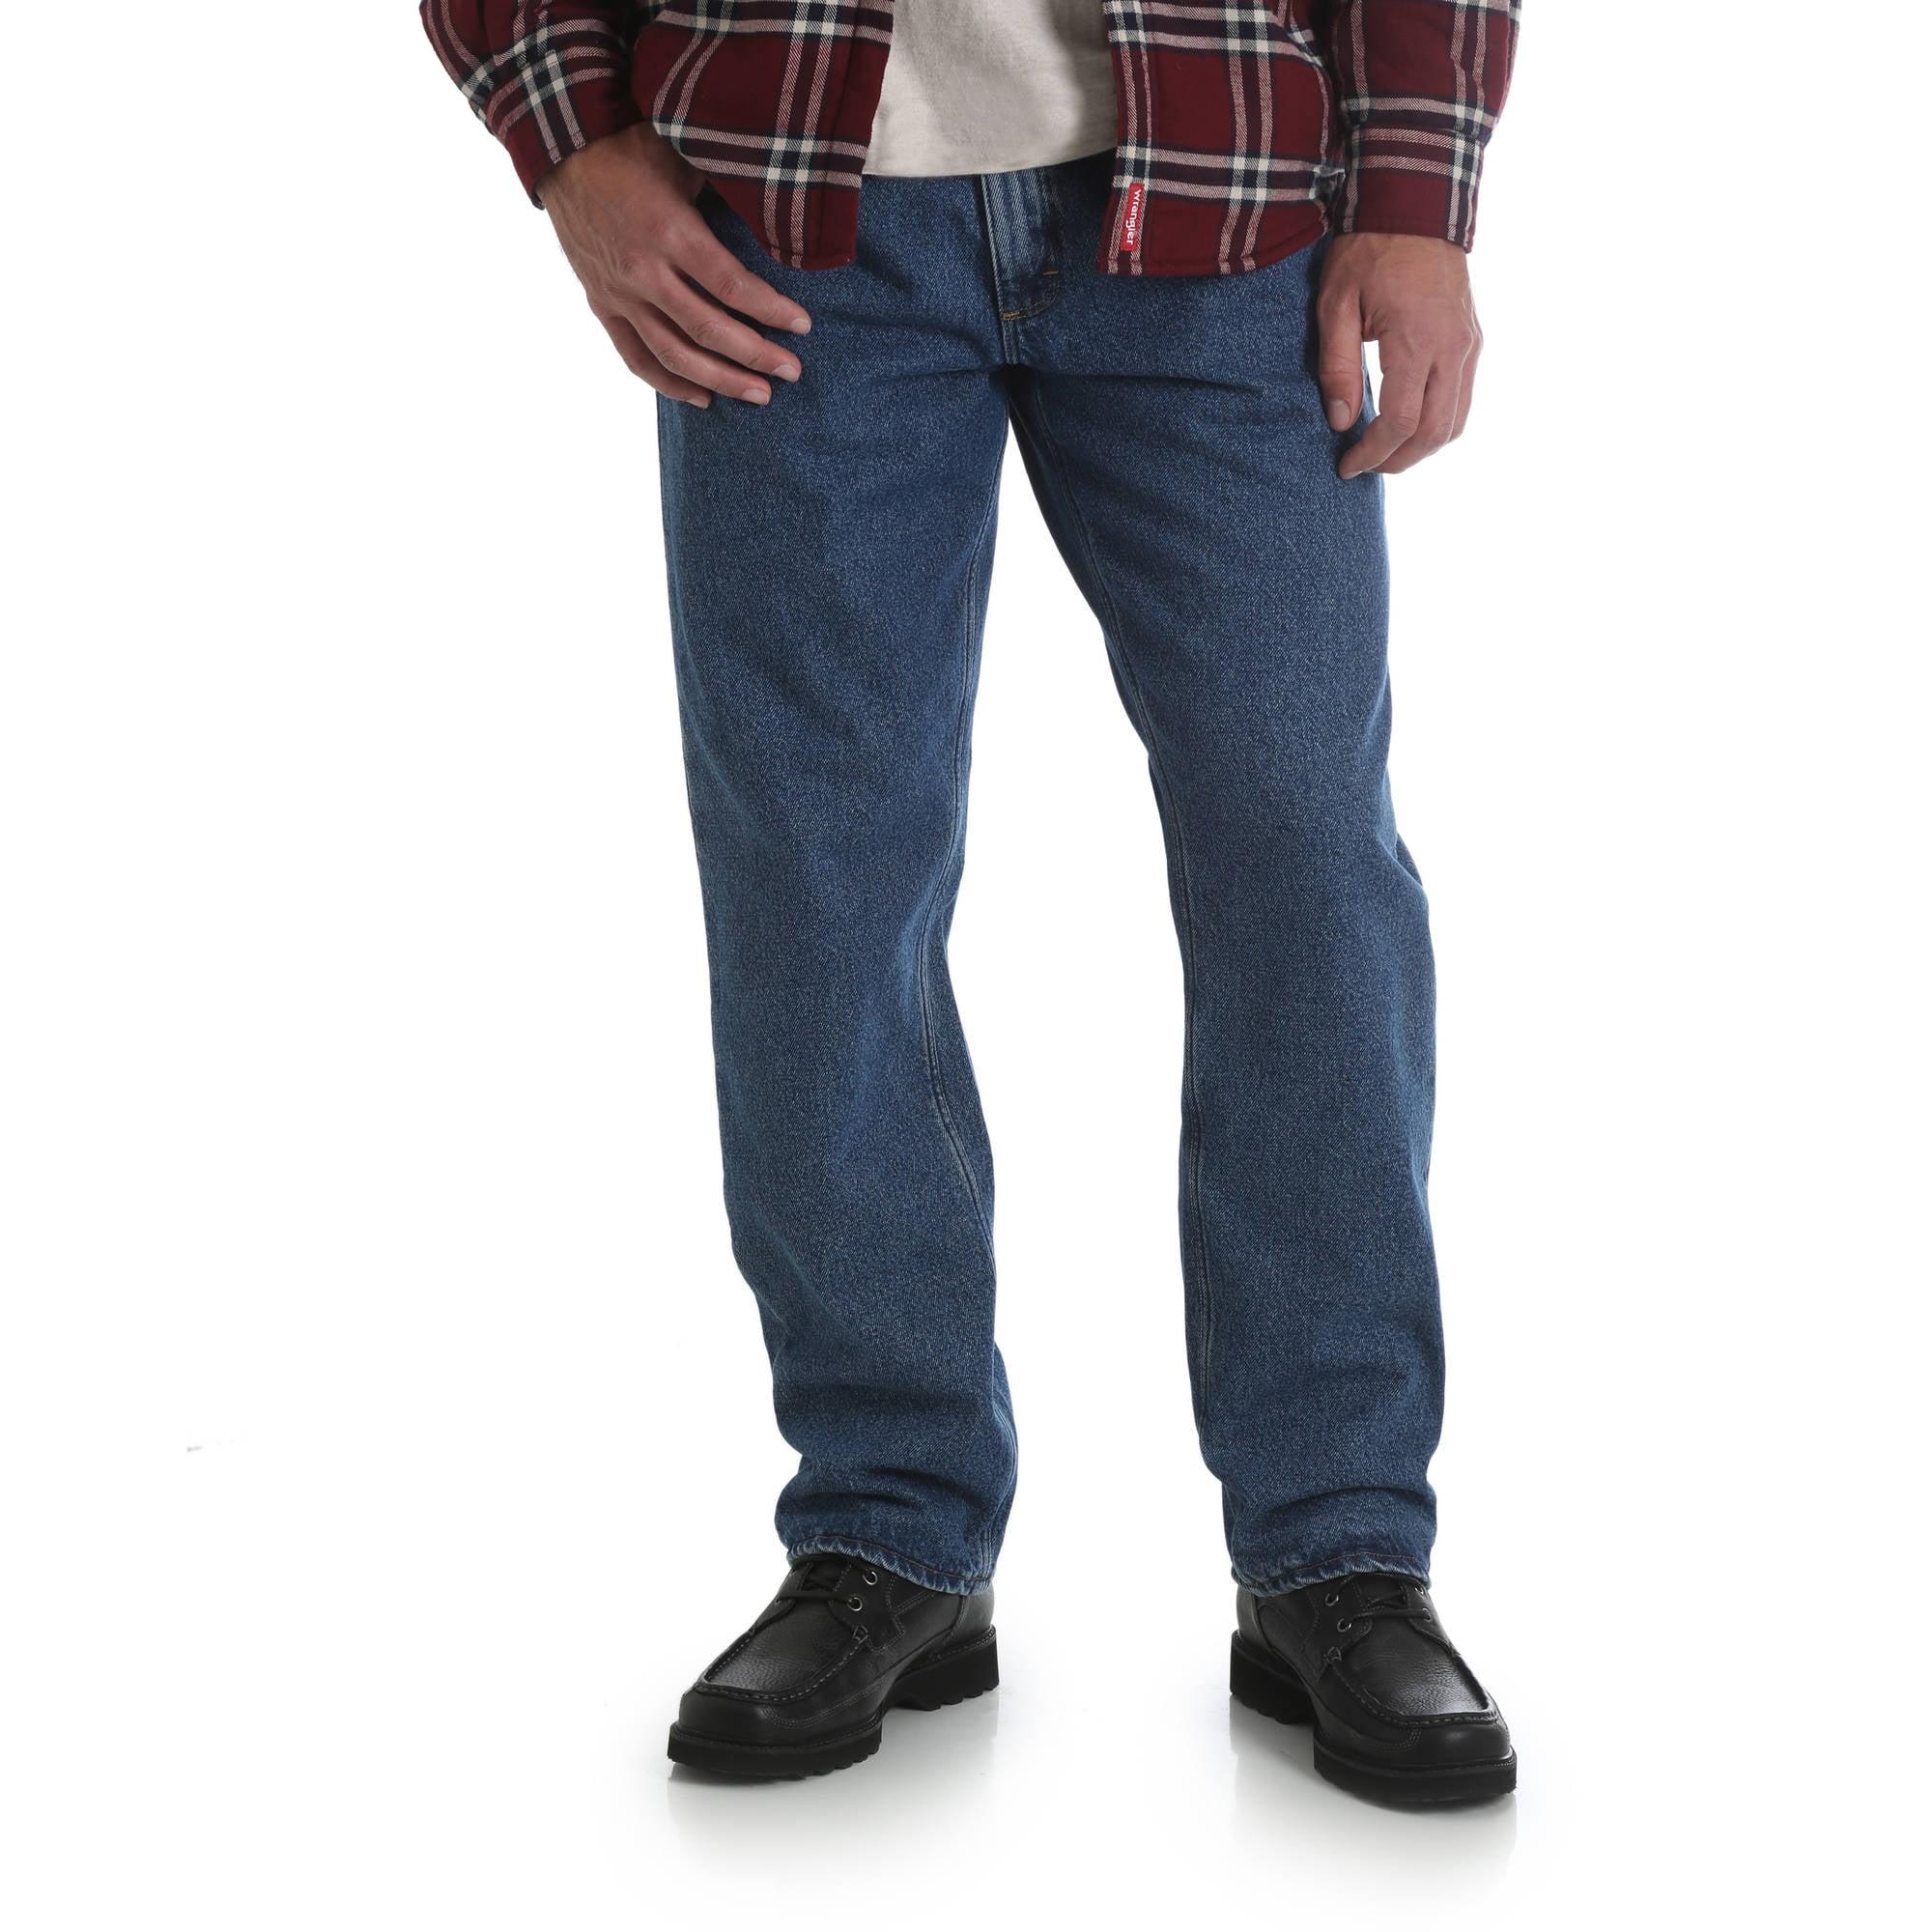 e6498b63 Wrangler - Men's Fleece Lined Relaxed Fit Jean - Walmart.com